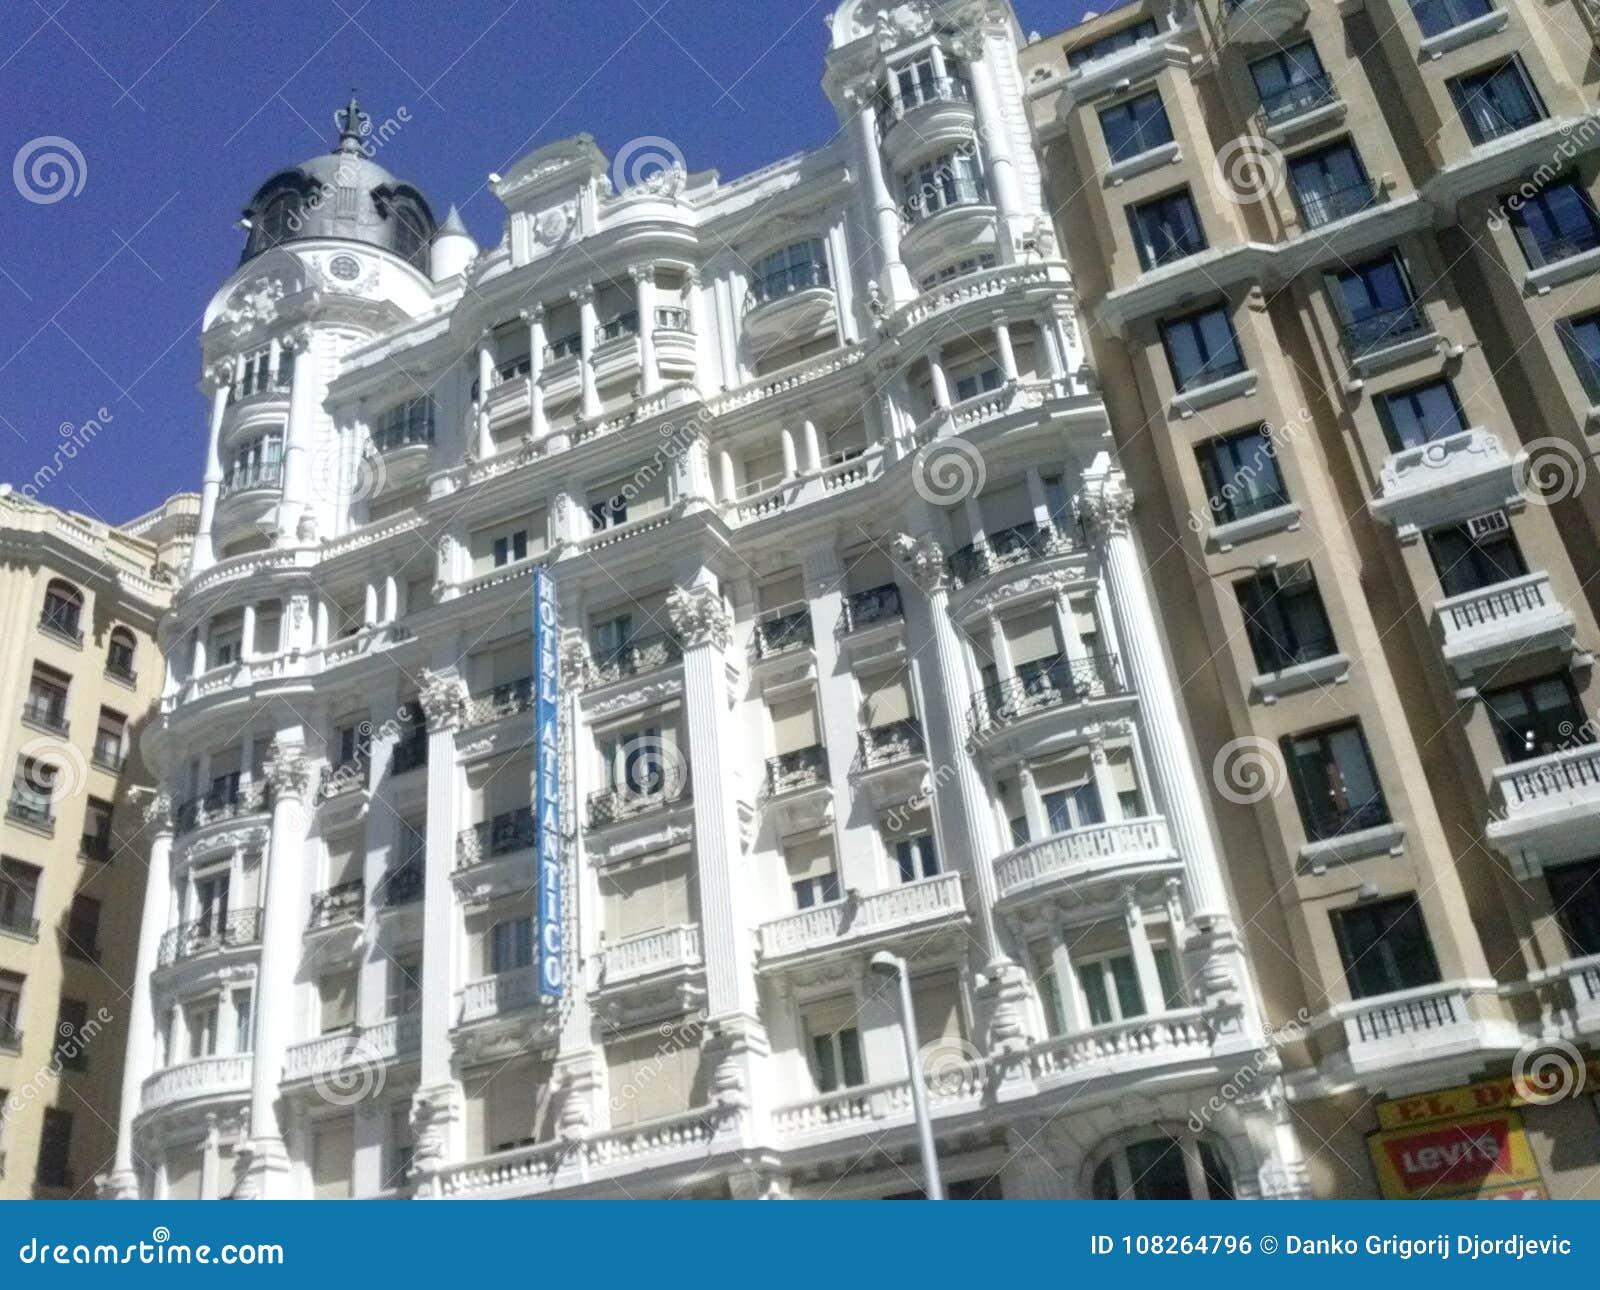 Architectonic building in Center of Madrid, Espana